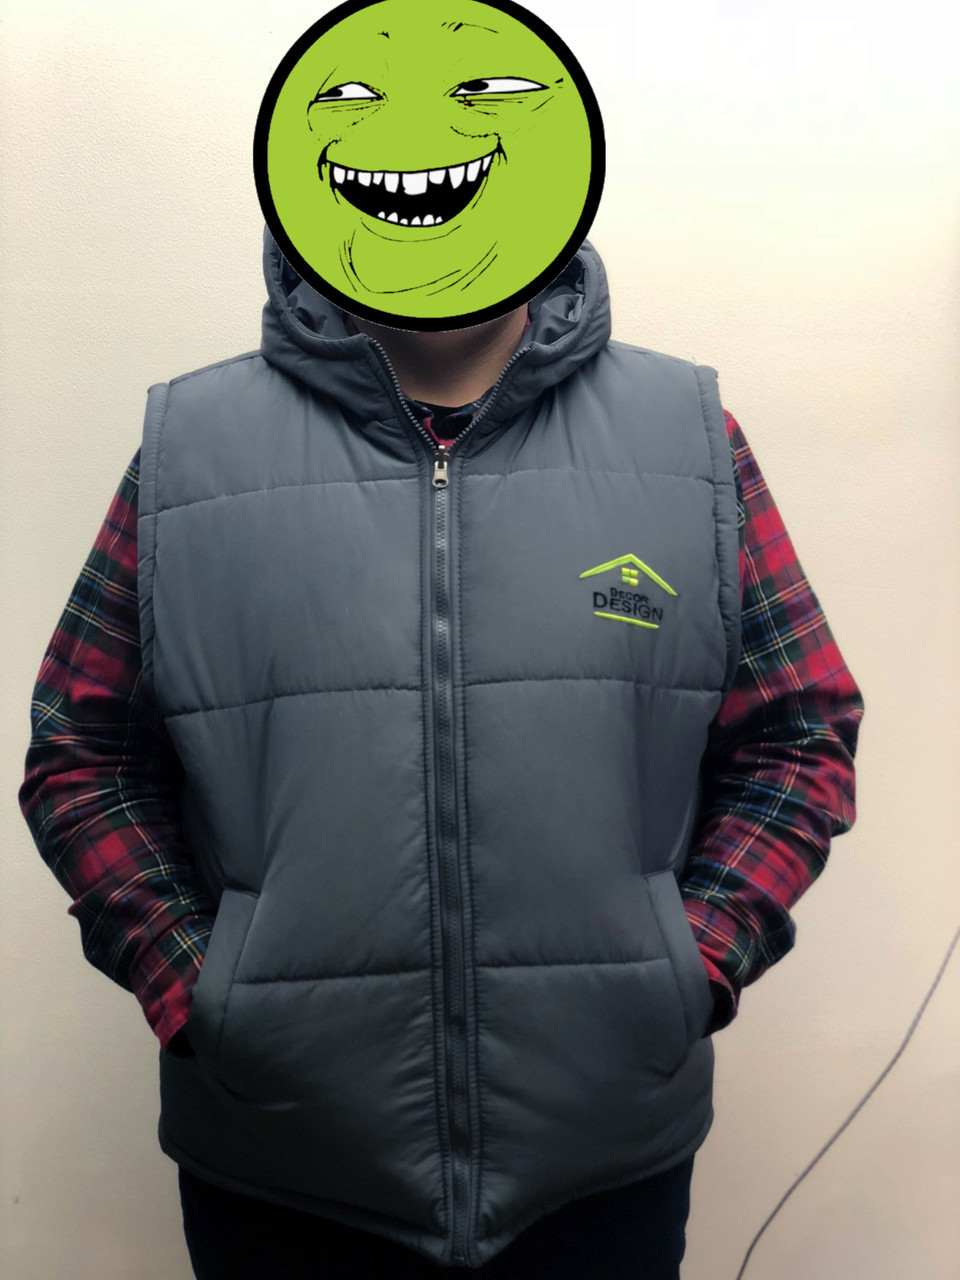 Двусторонняя брендовая куртка-безрукавка от Decor Design